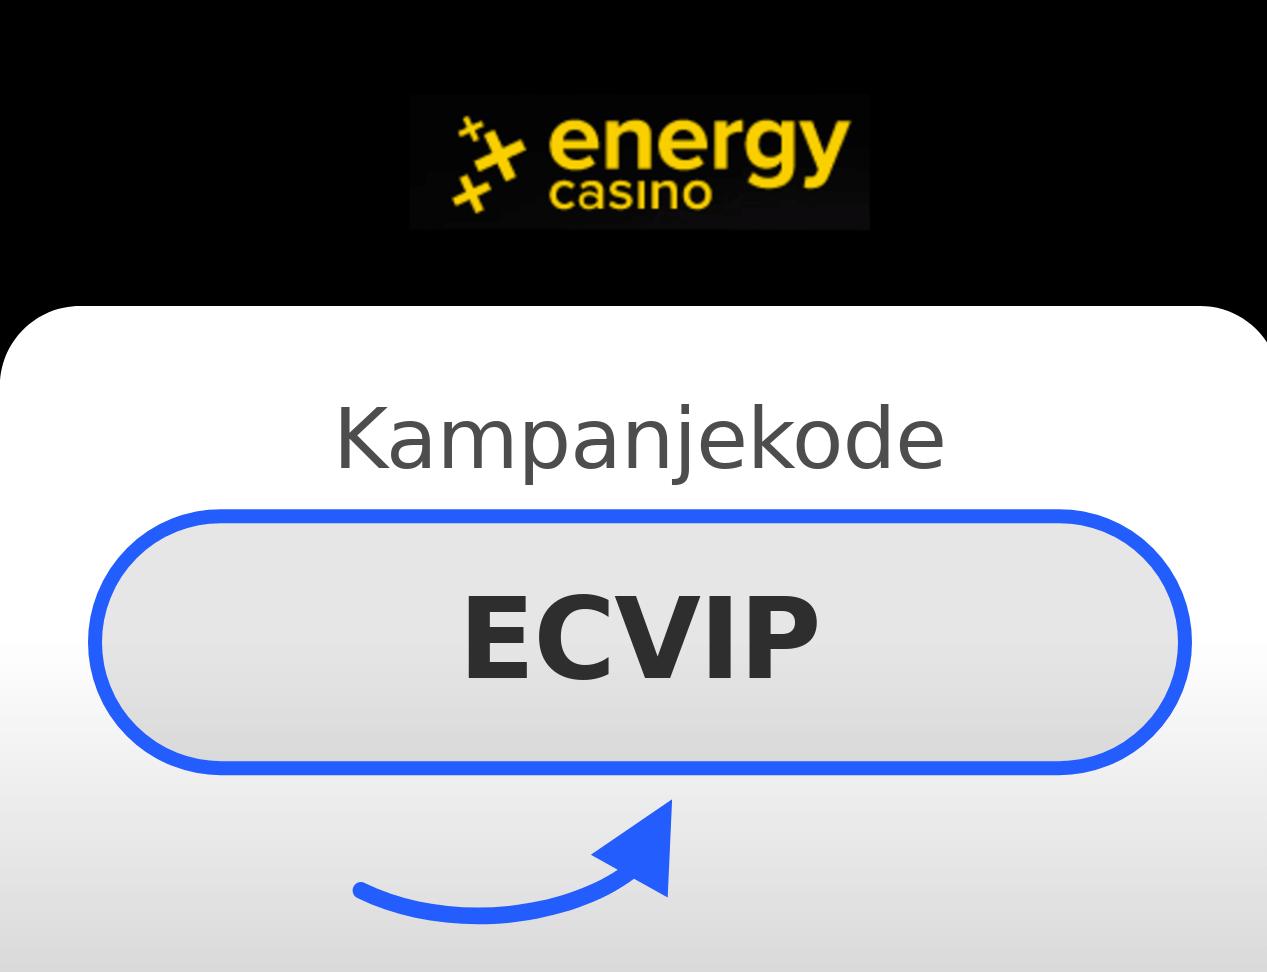 Energy Casino Kampanjekode